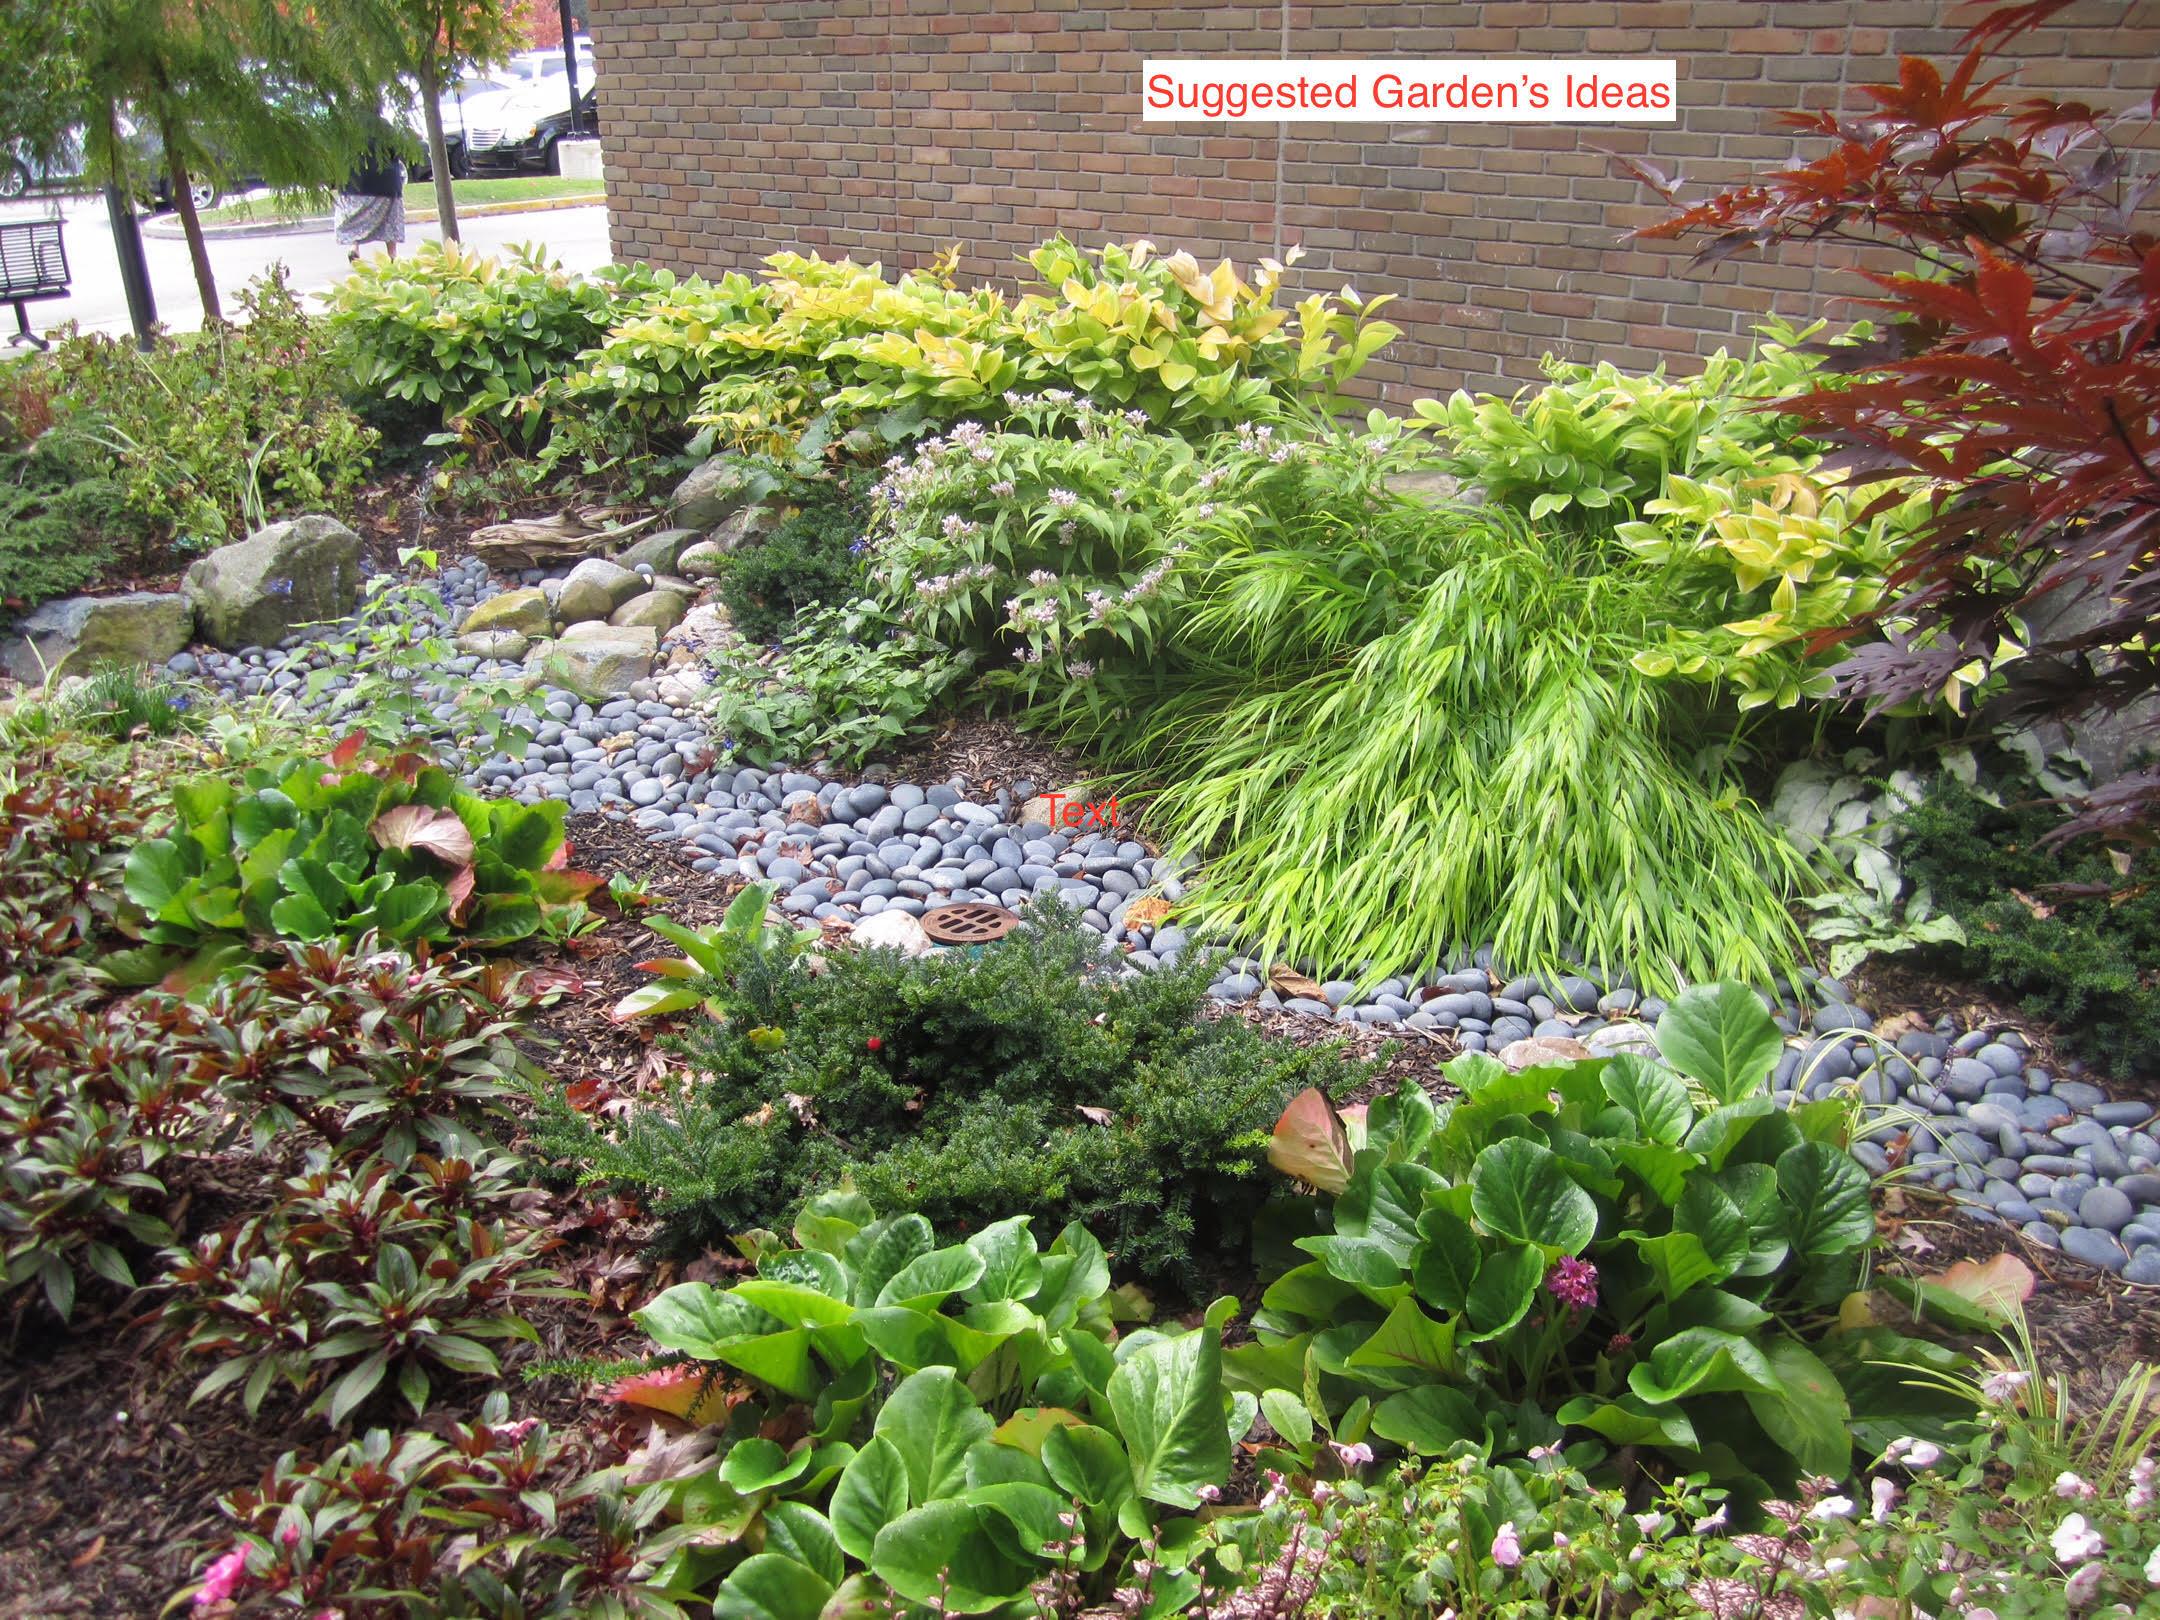 Halsey Street - Suggested garden ideas_1.jpg